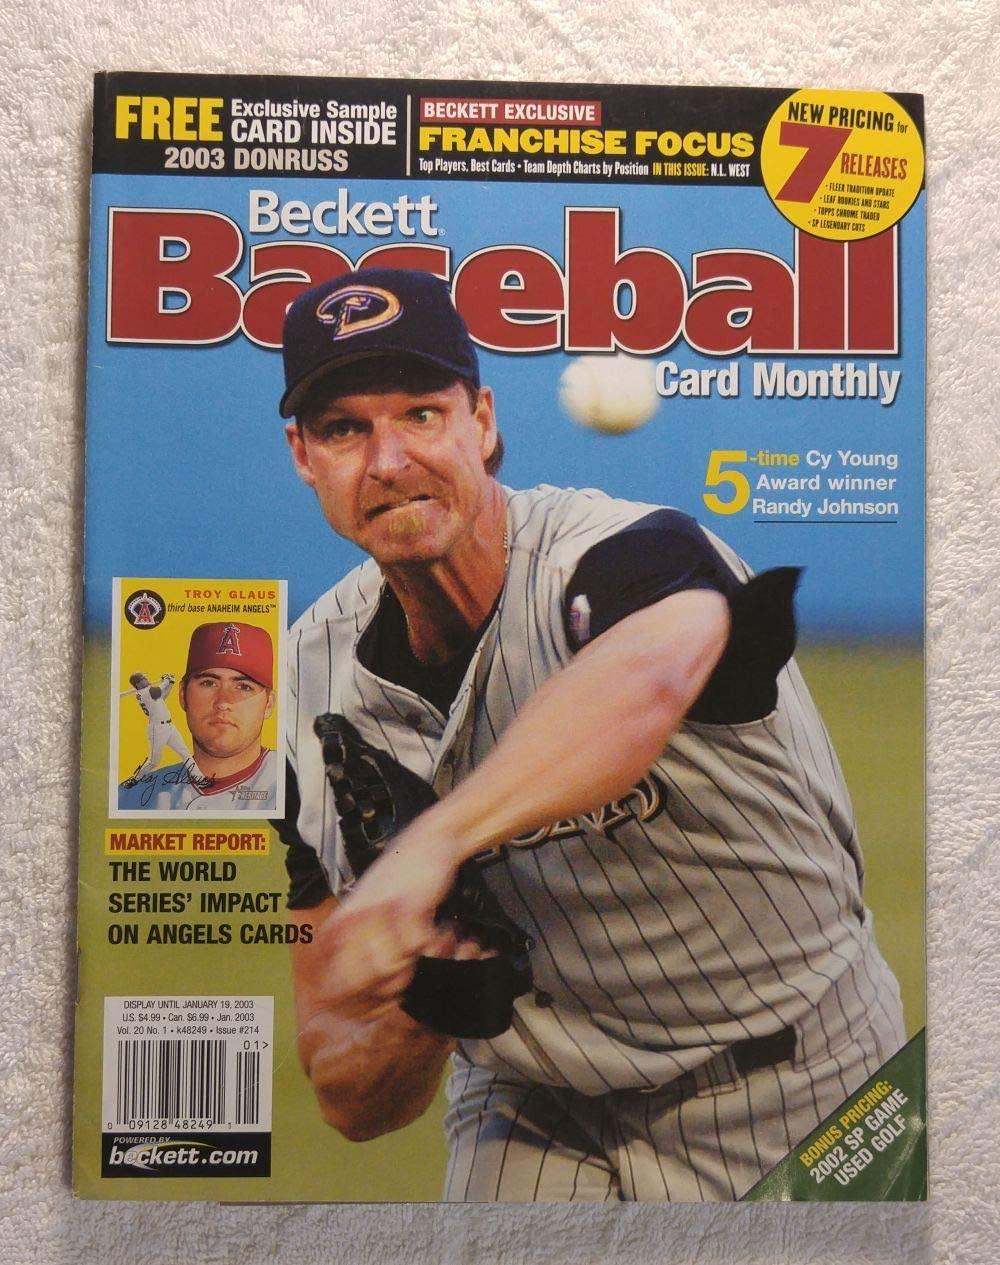 Randy Johnson - Arizona Diamondbacks - 5-Time Cy Young Award Winner - Beckett Baseball Card Monthly - #214 - January 2003